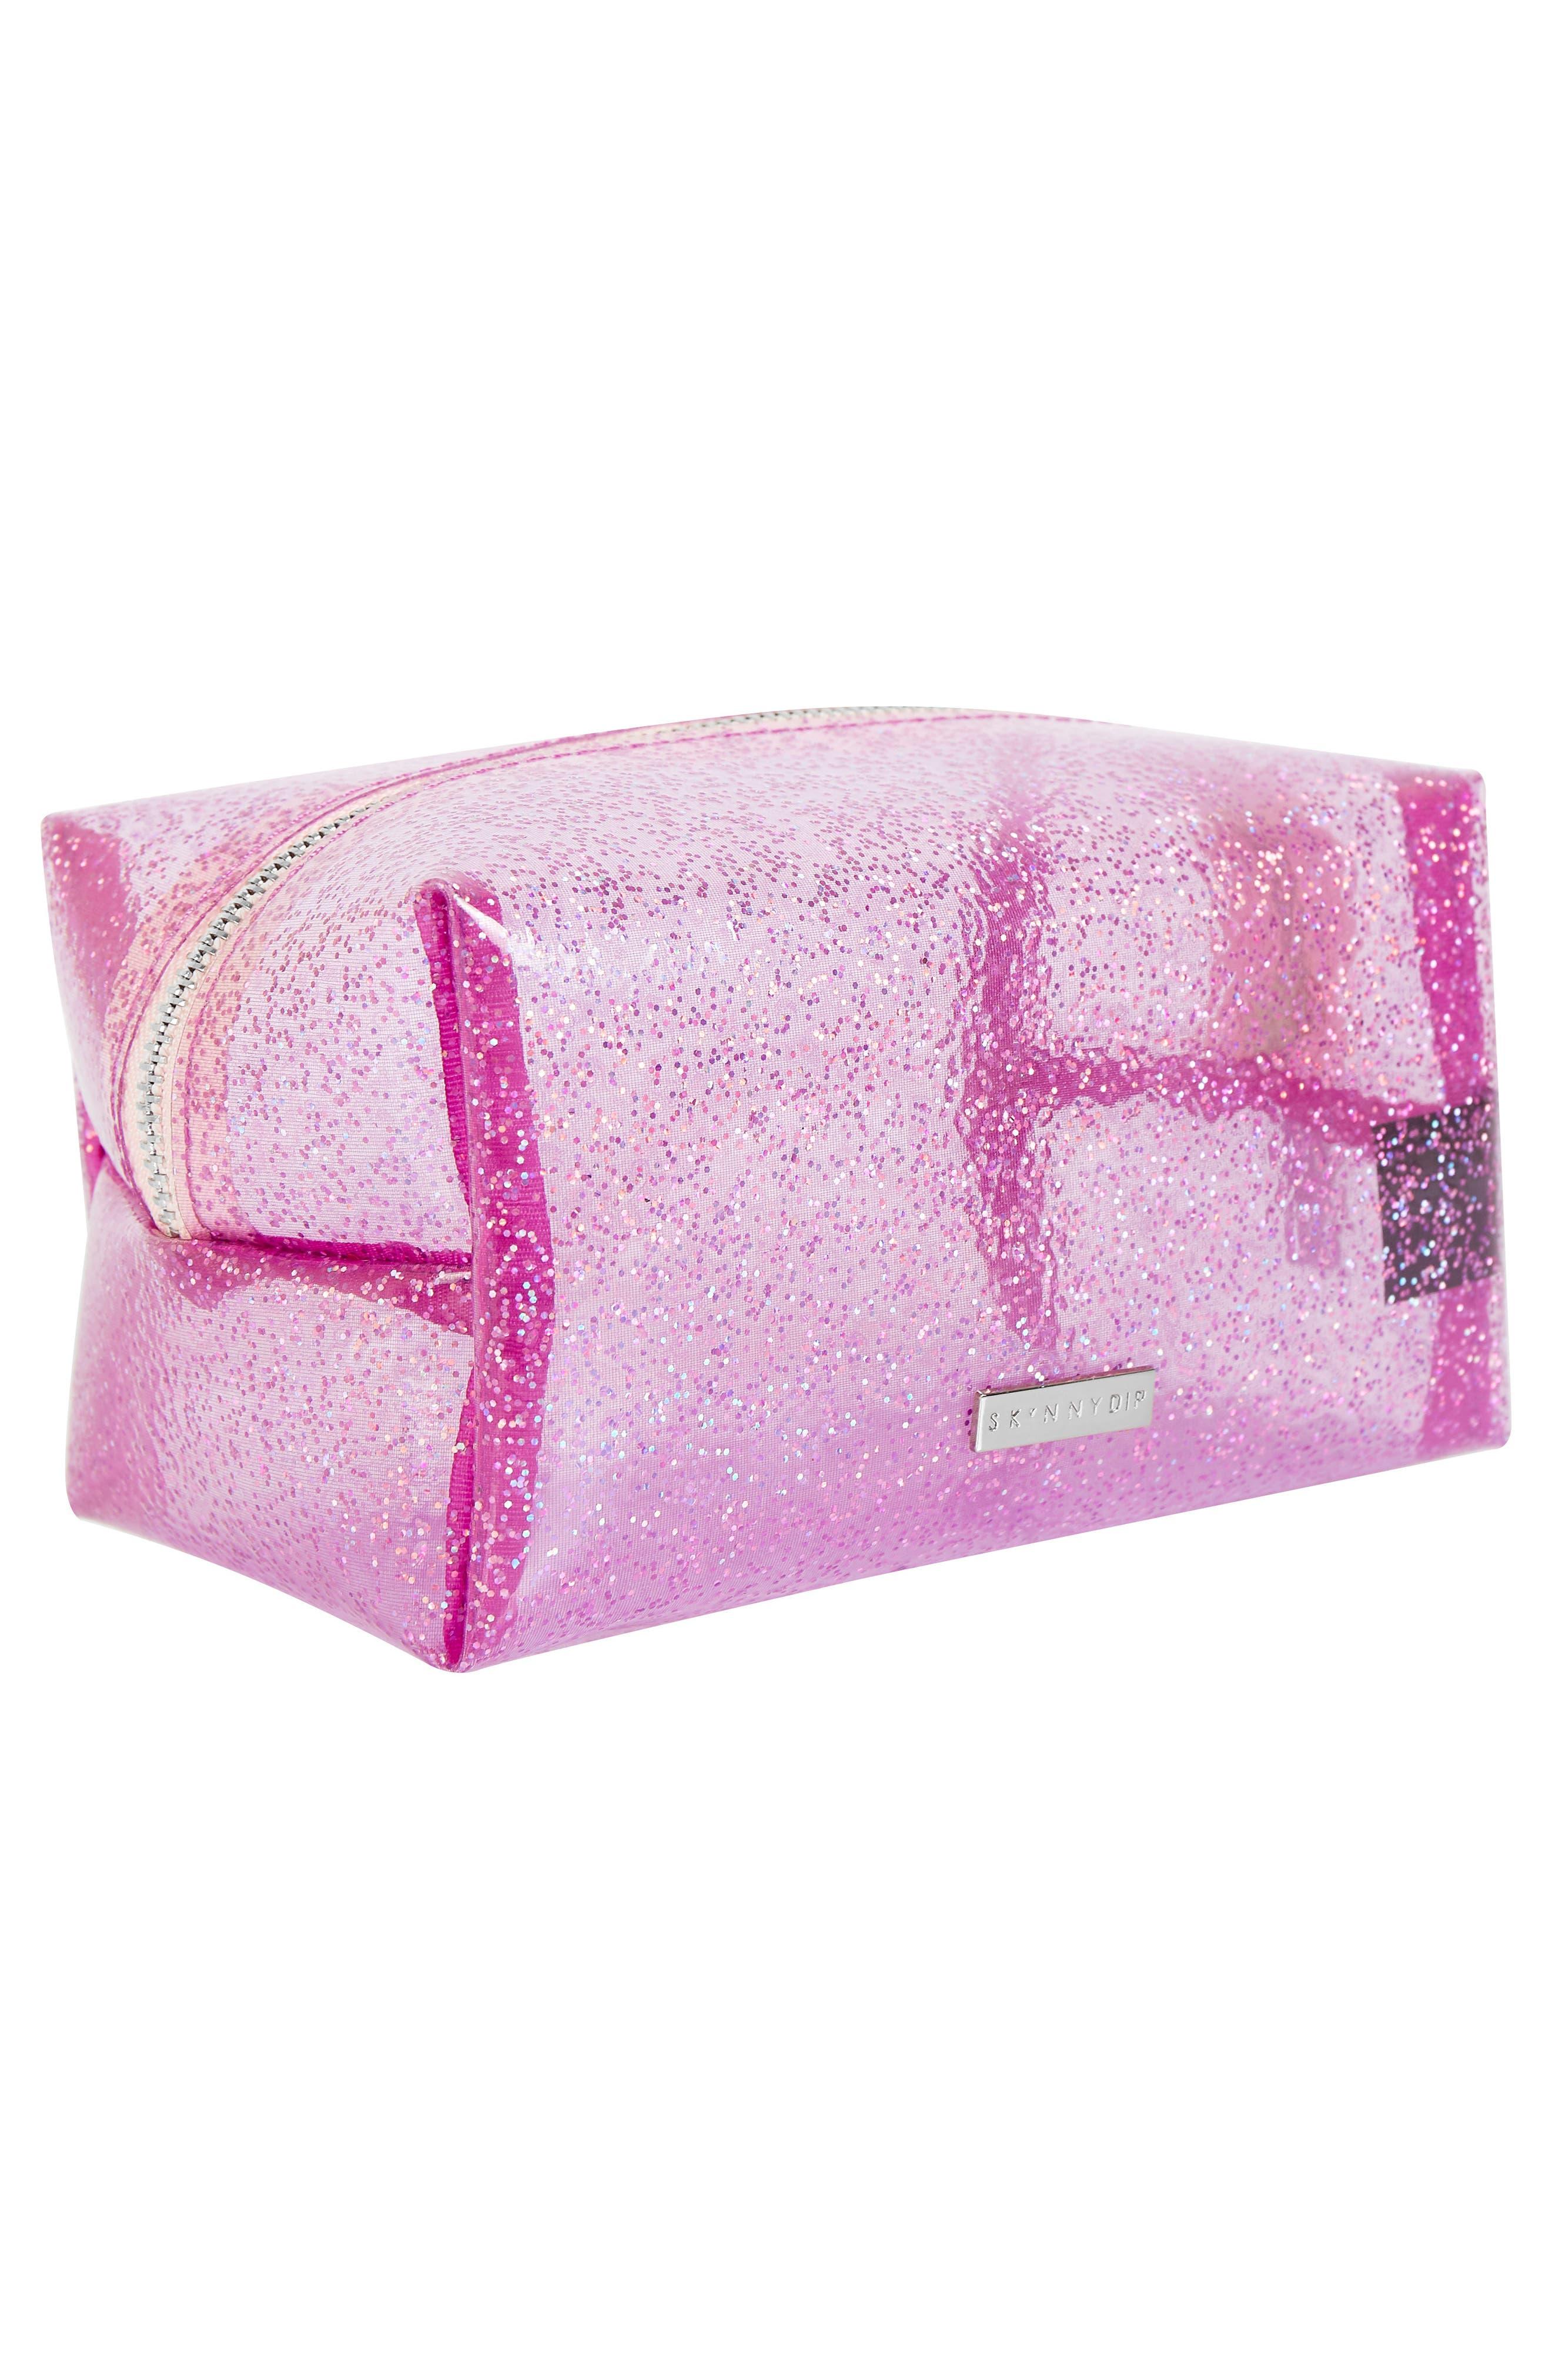 Skinny Dip Glitter Bomb Makeup Bag,                             Alternate thumbnail 2, color,                             No Color